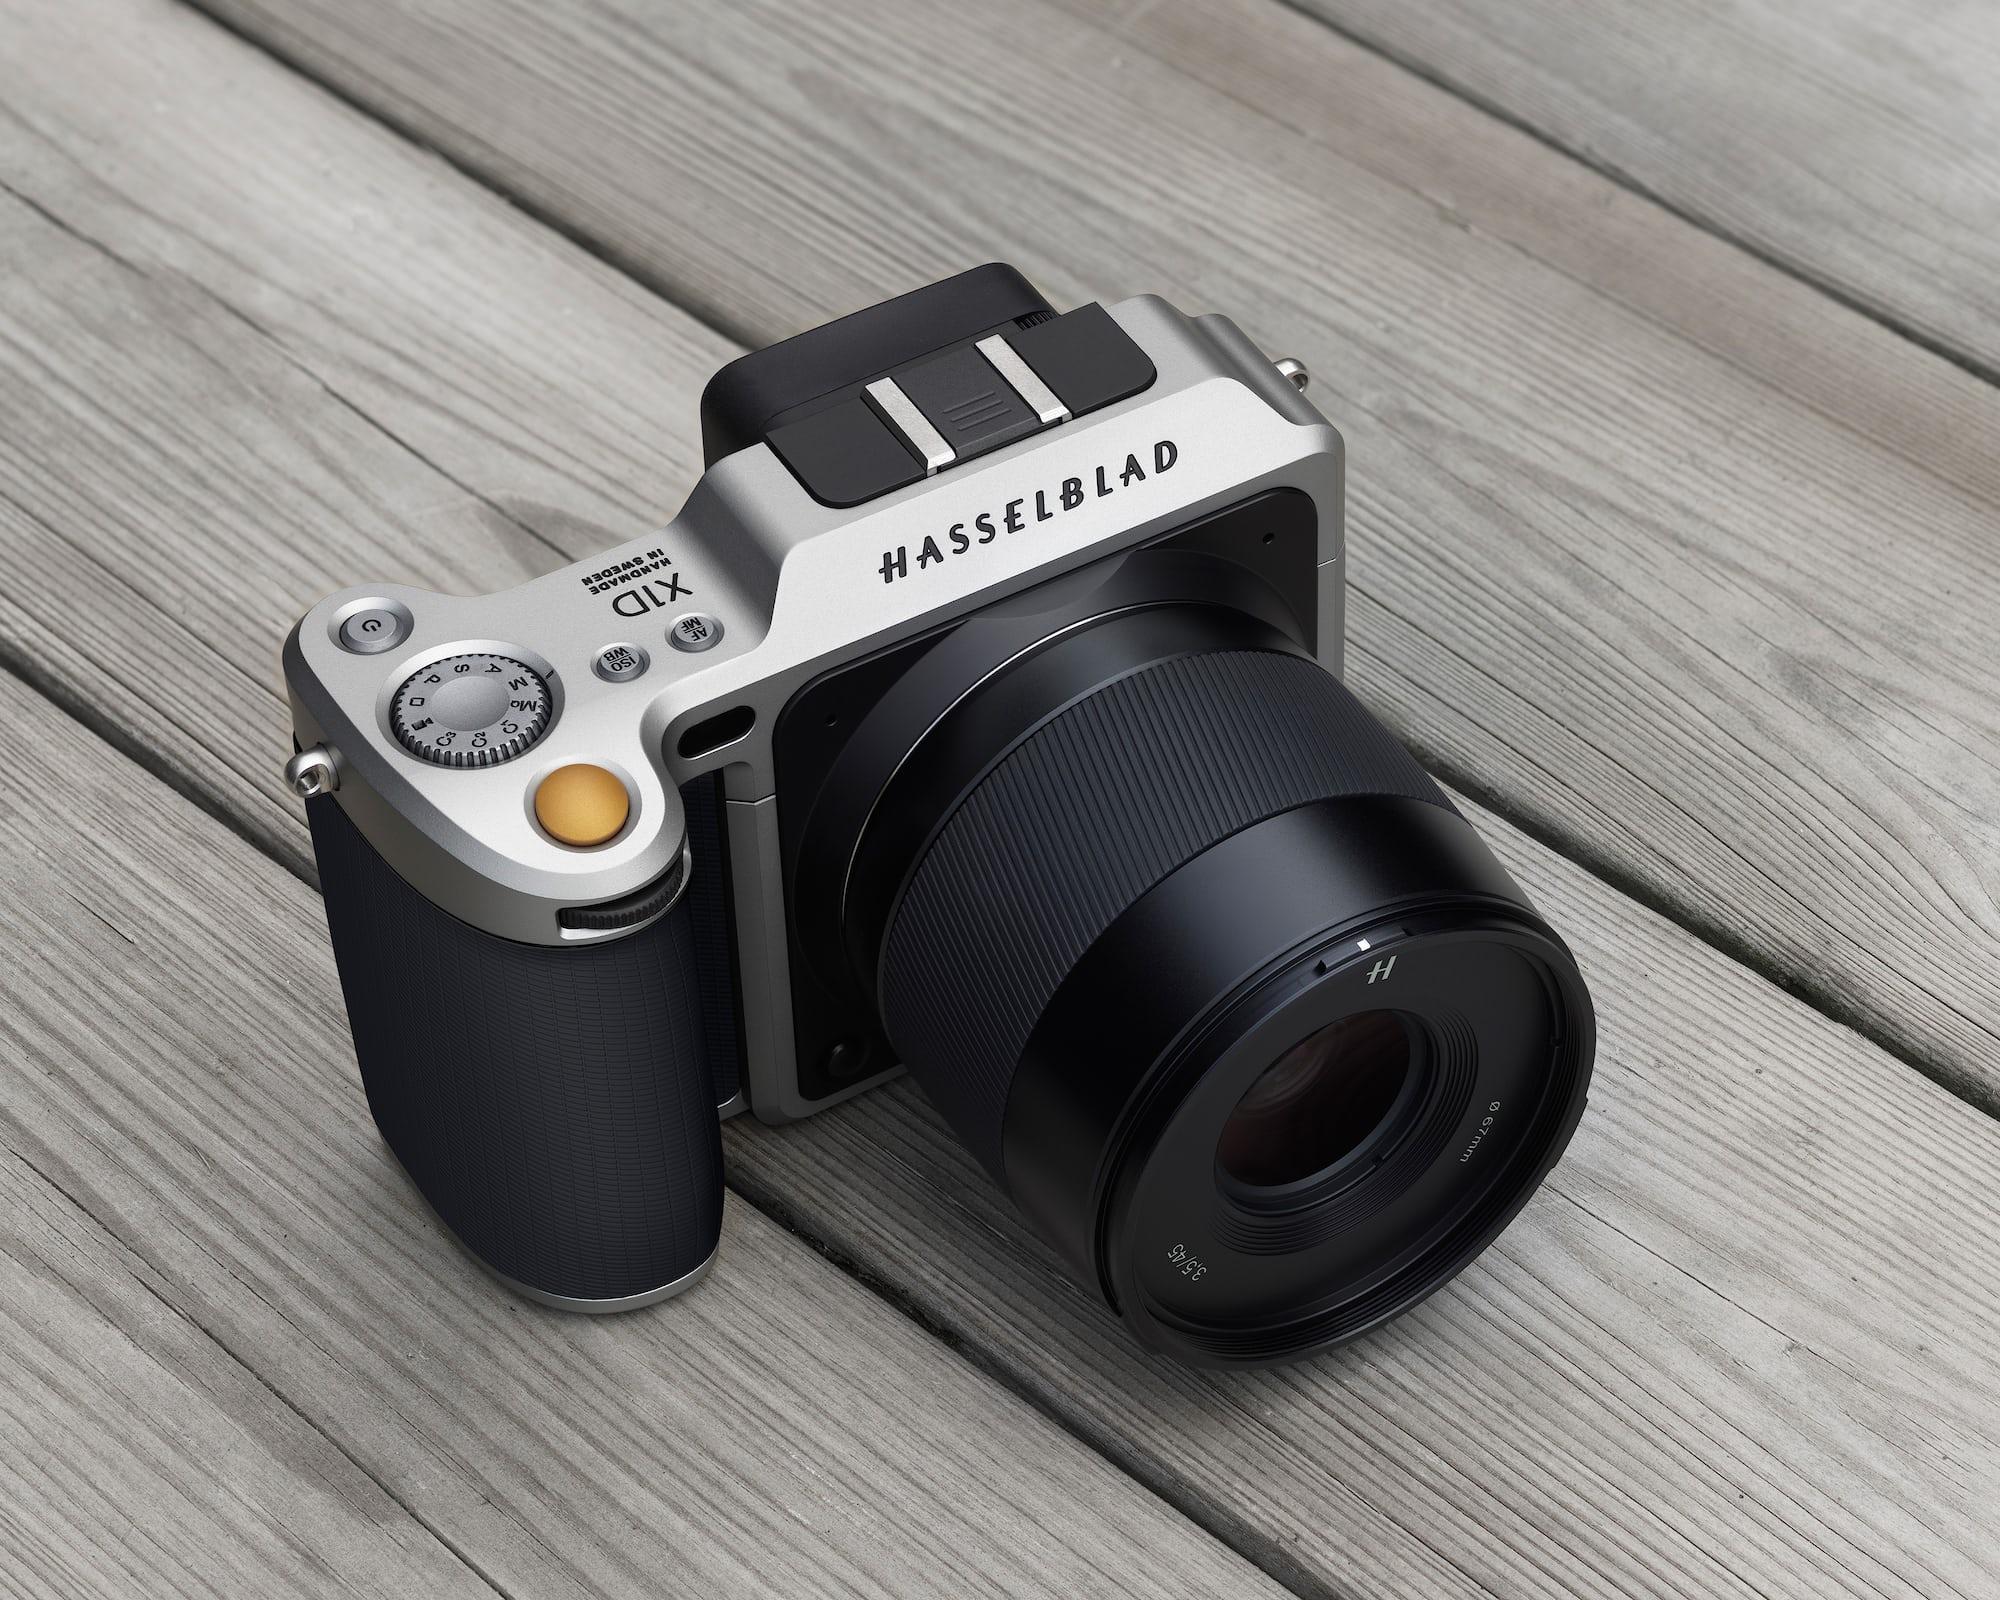 Hasselblad x1d-50c, lifestyle image